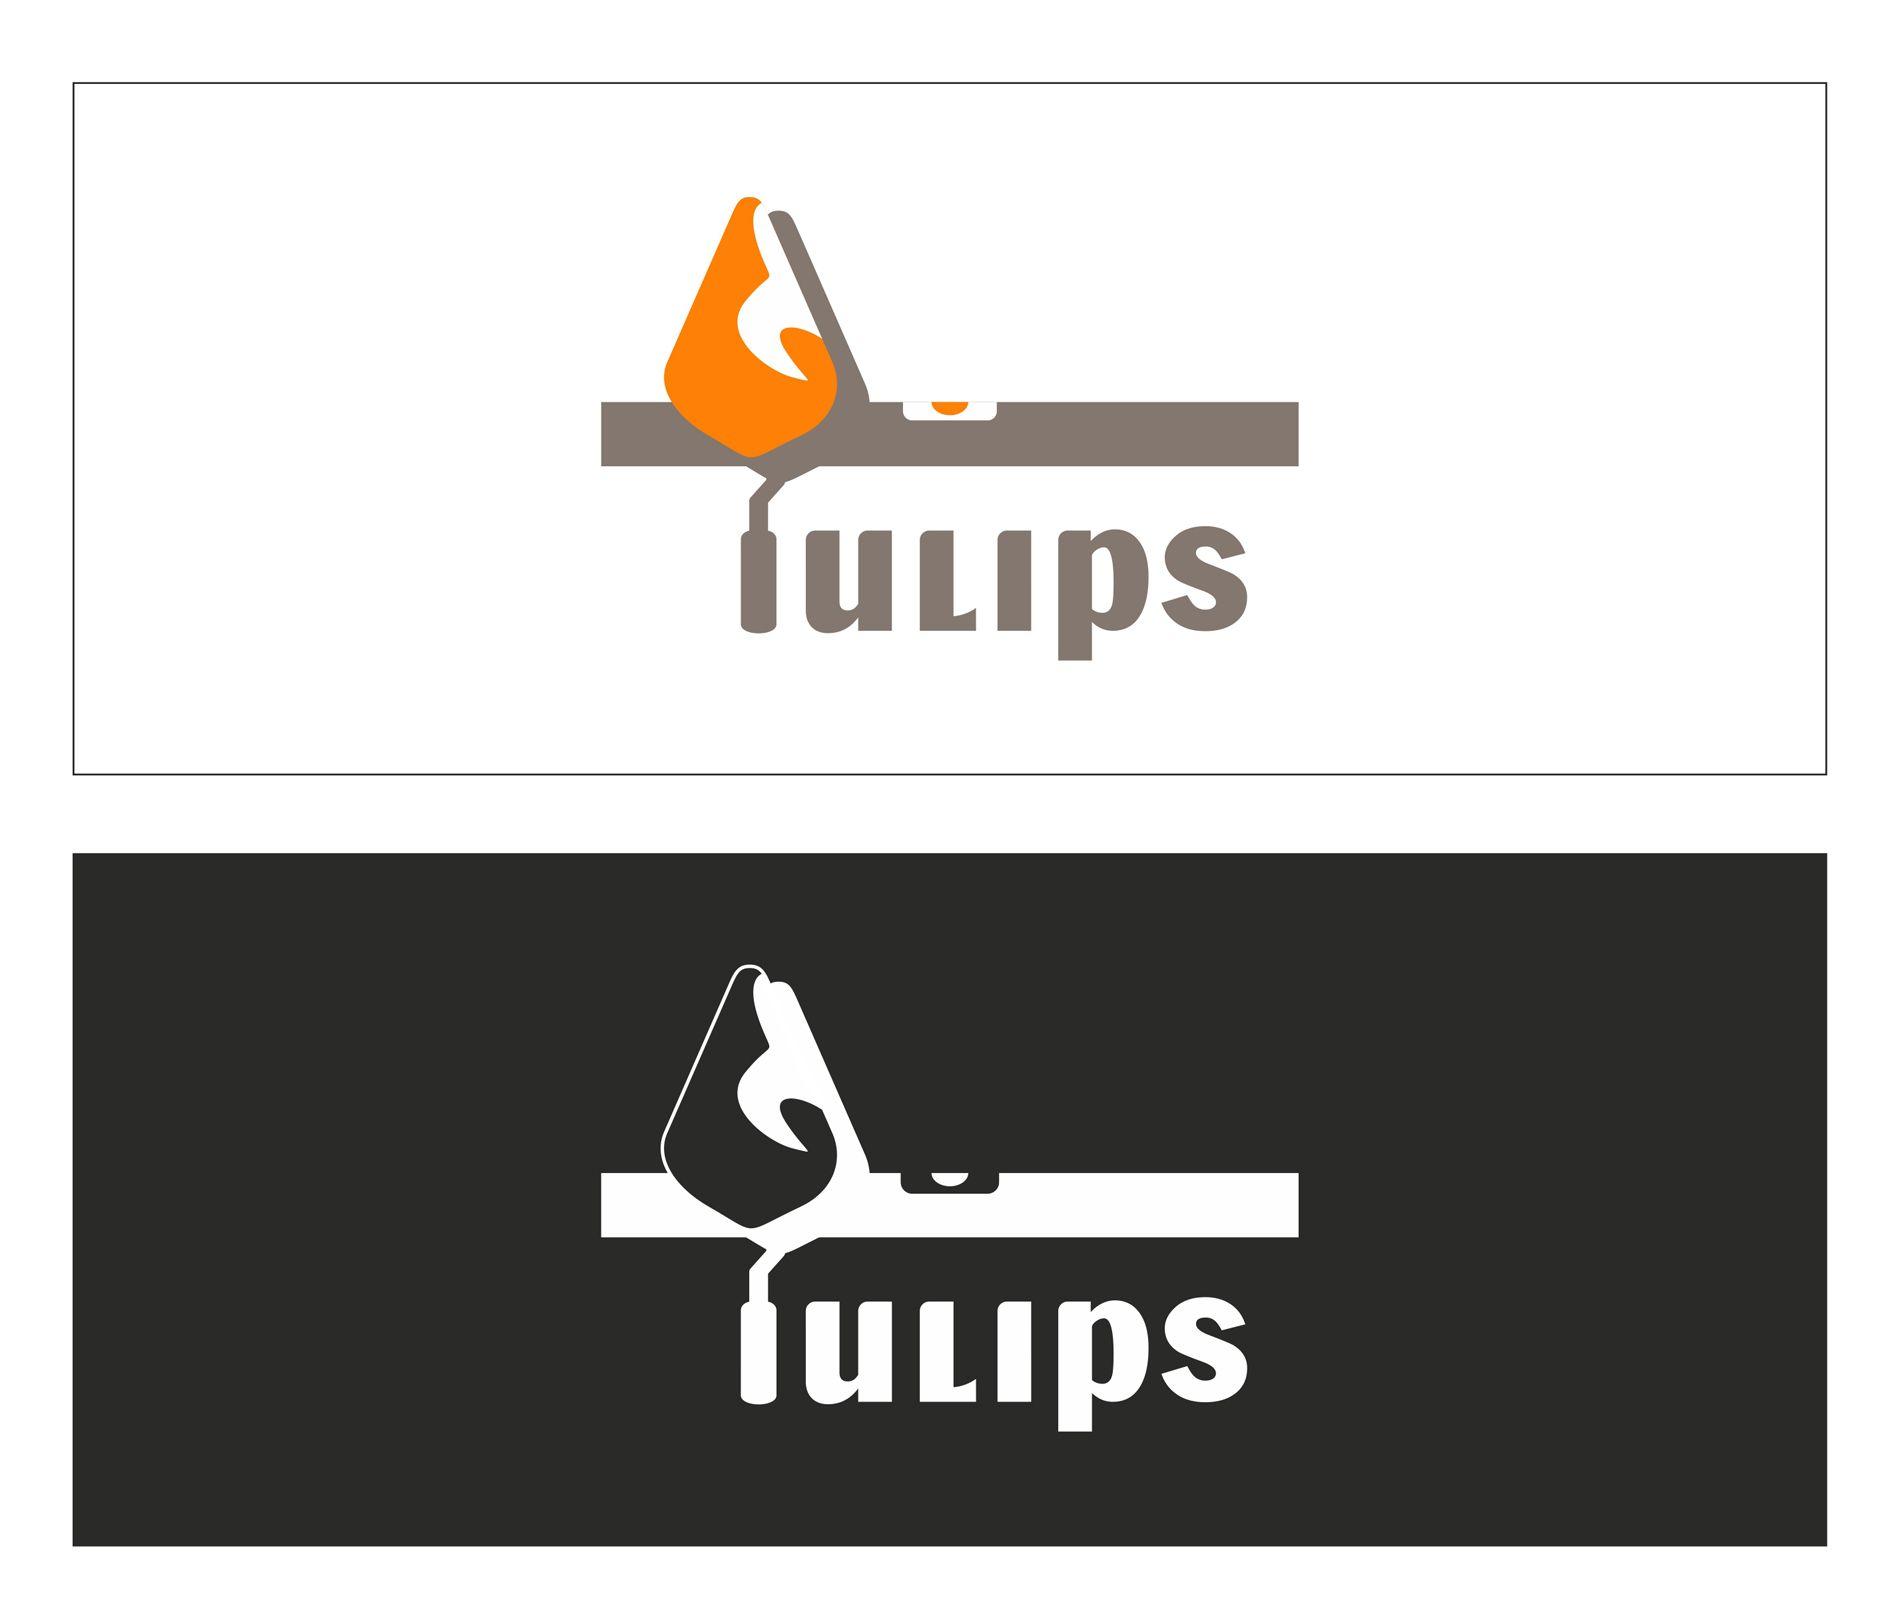 Tulips - дизайнер zooosad